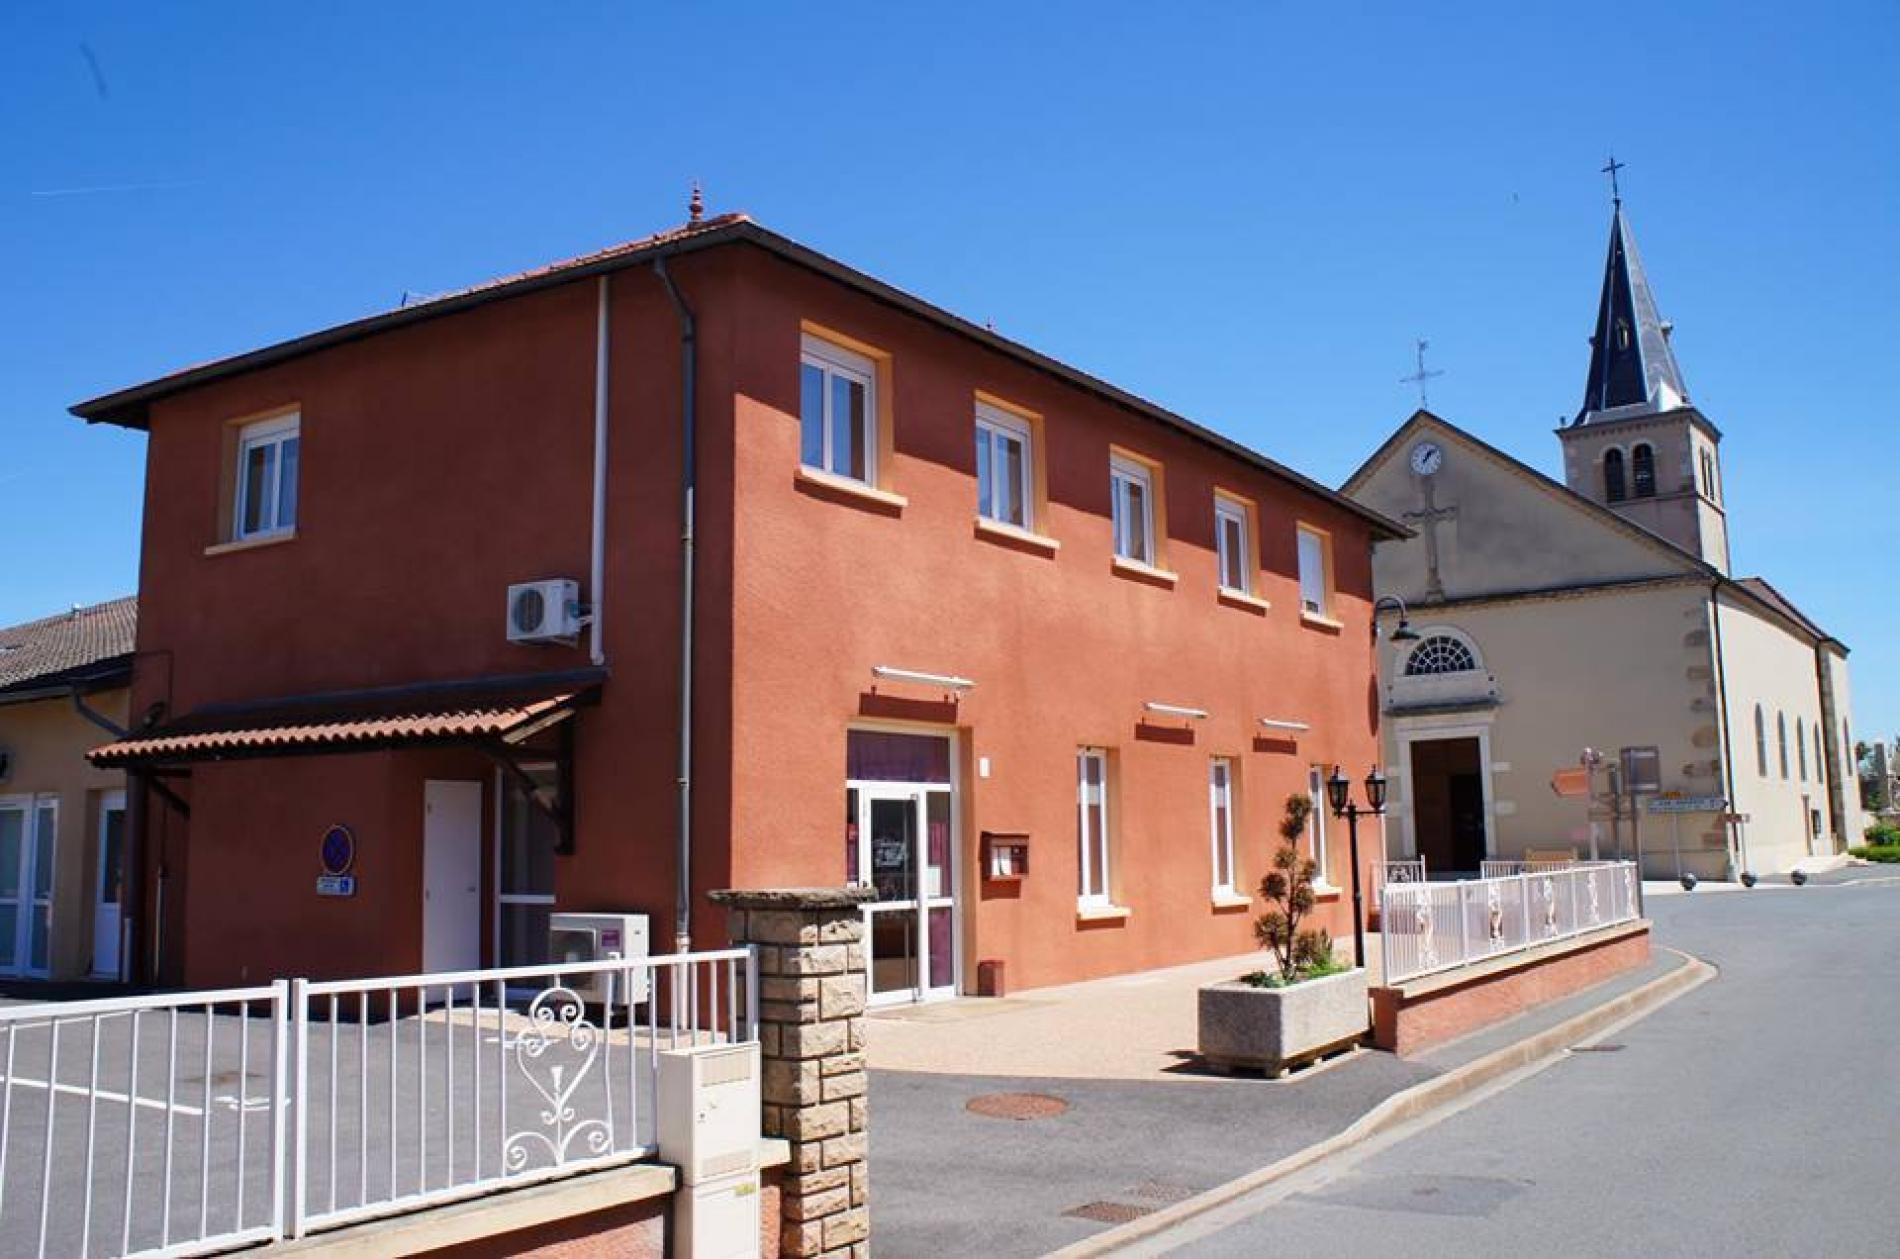 Hôtel** en Beaujolais